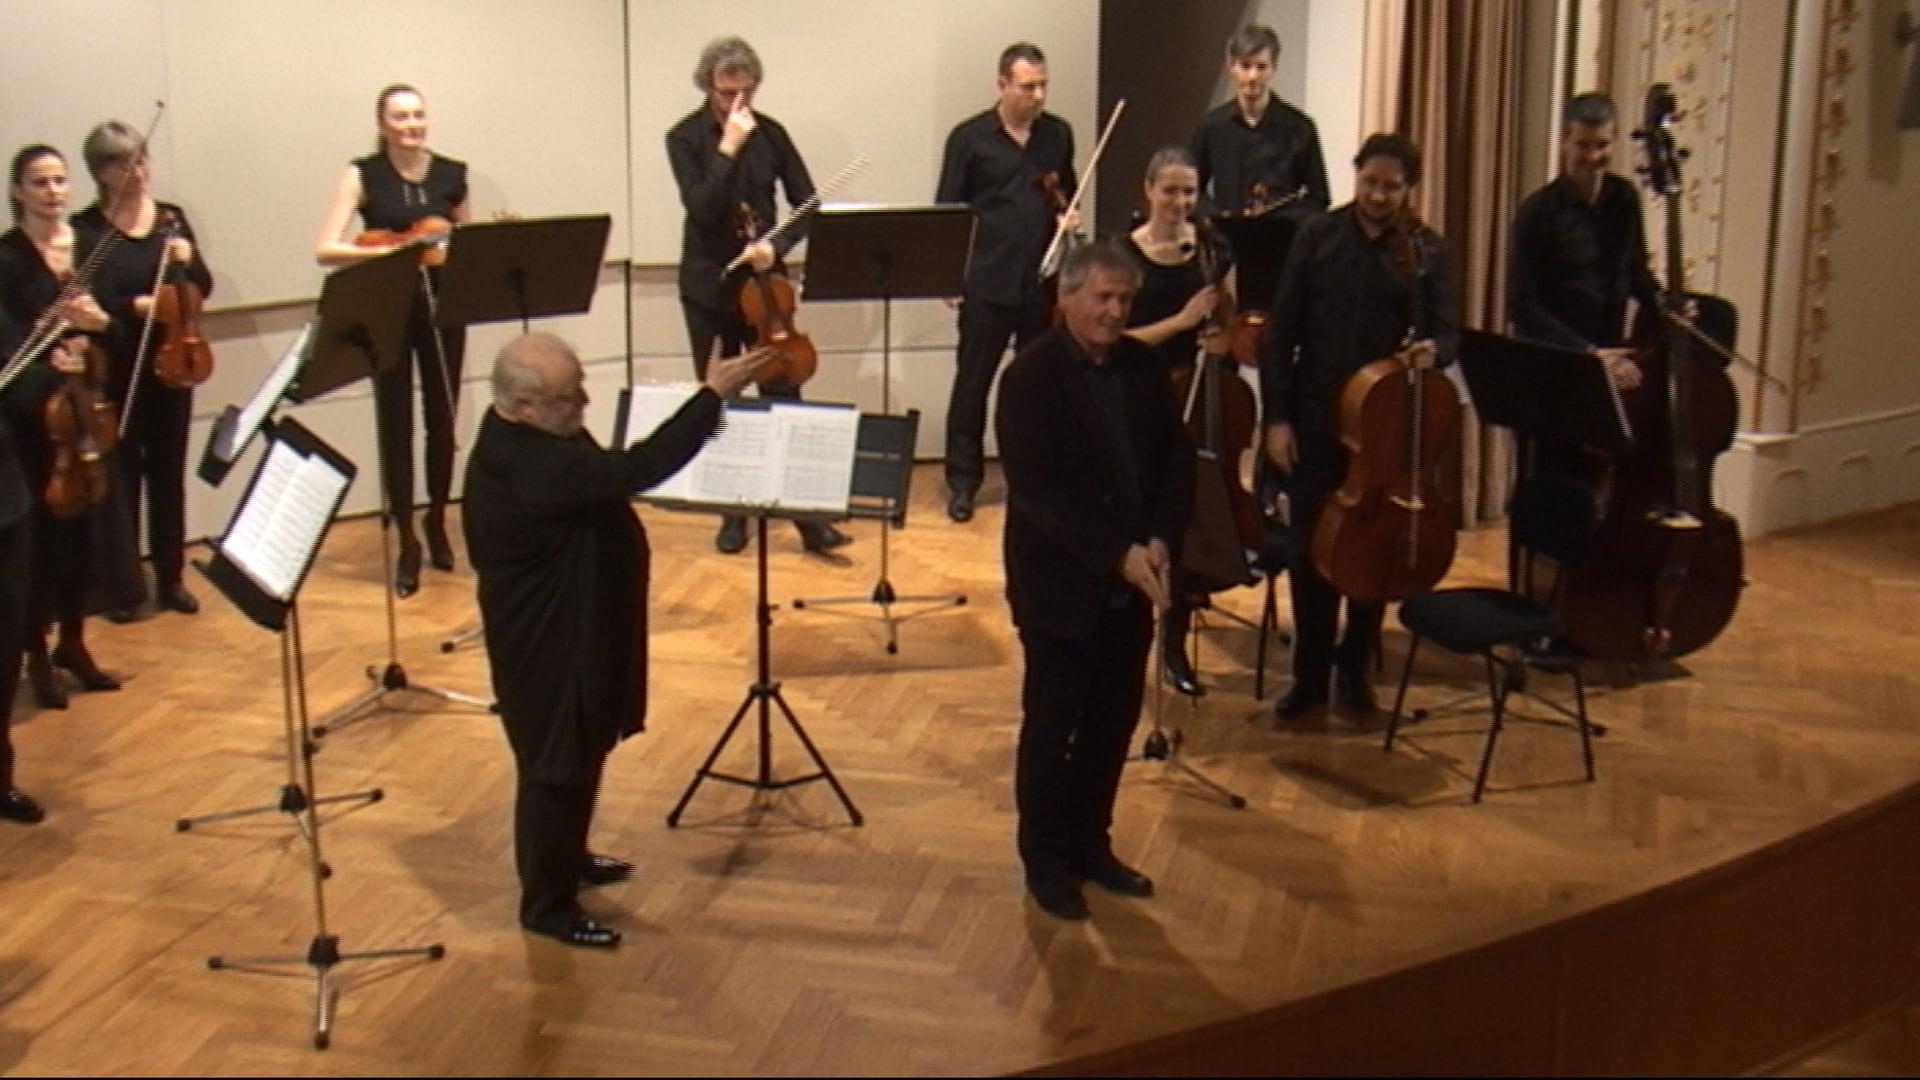 Grieg / Atterberg / Machajdík / Warlock